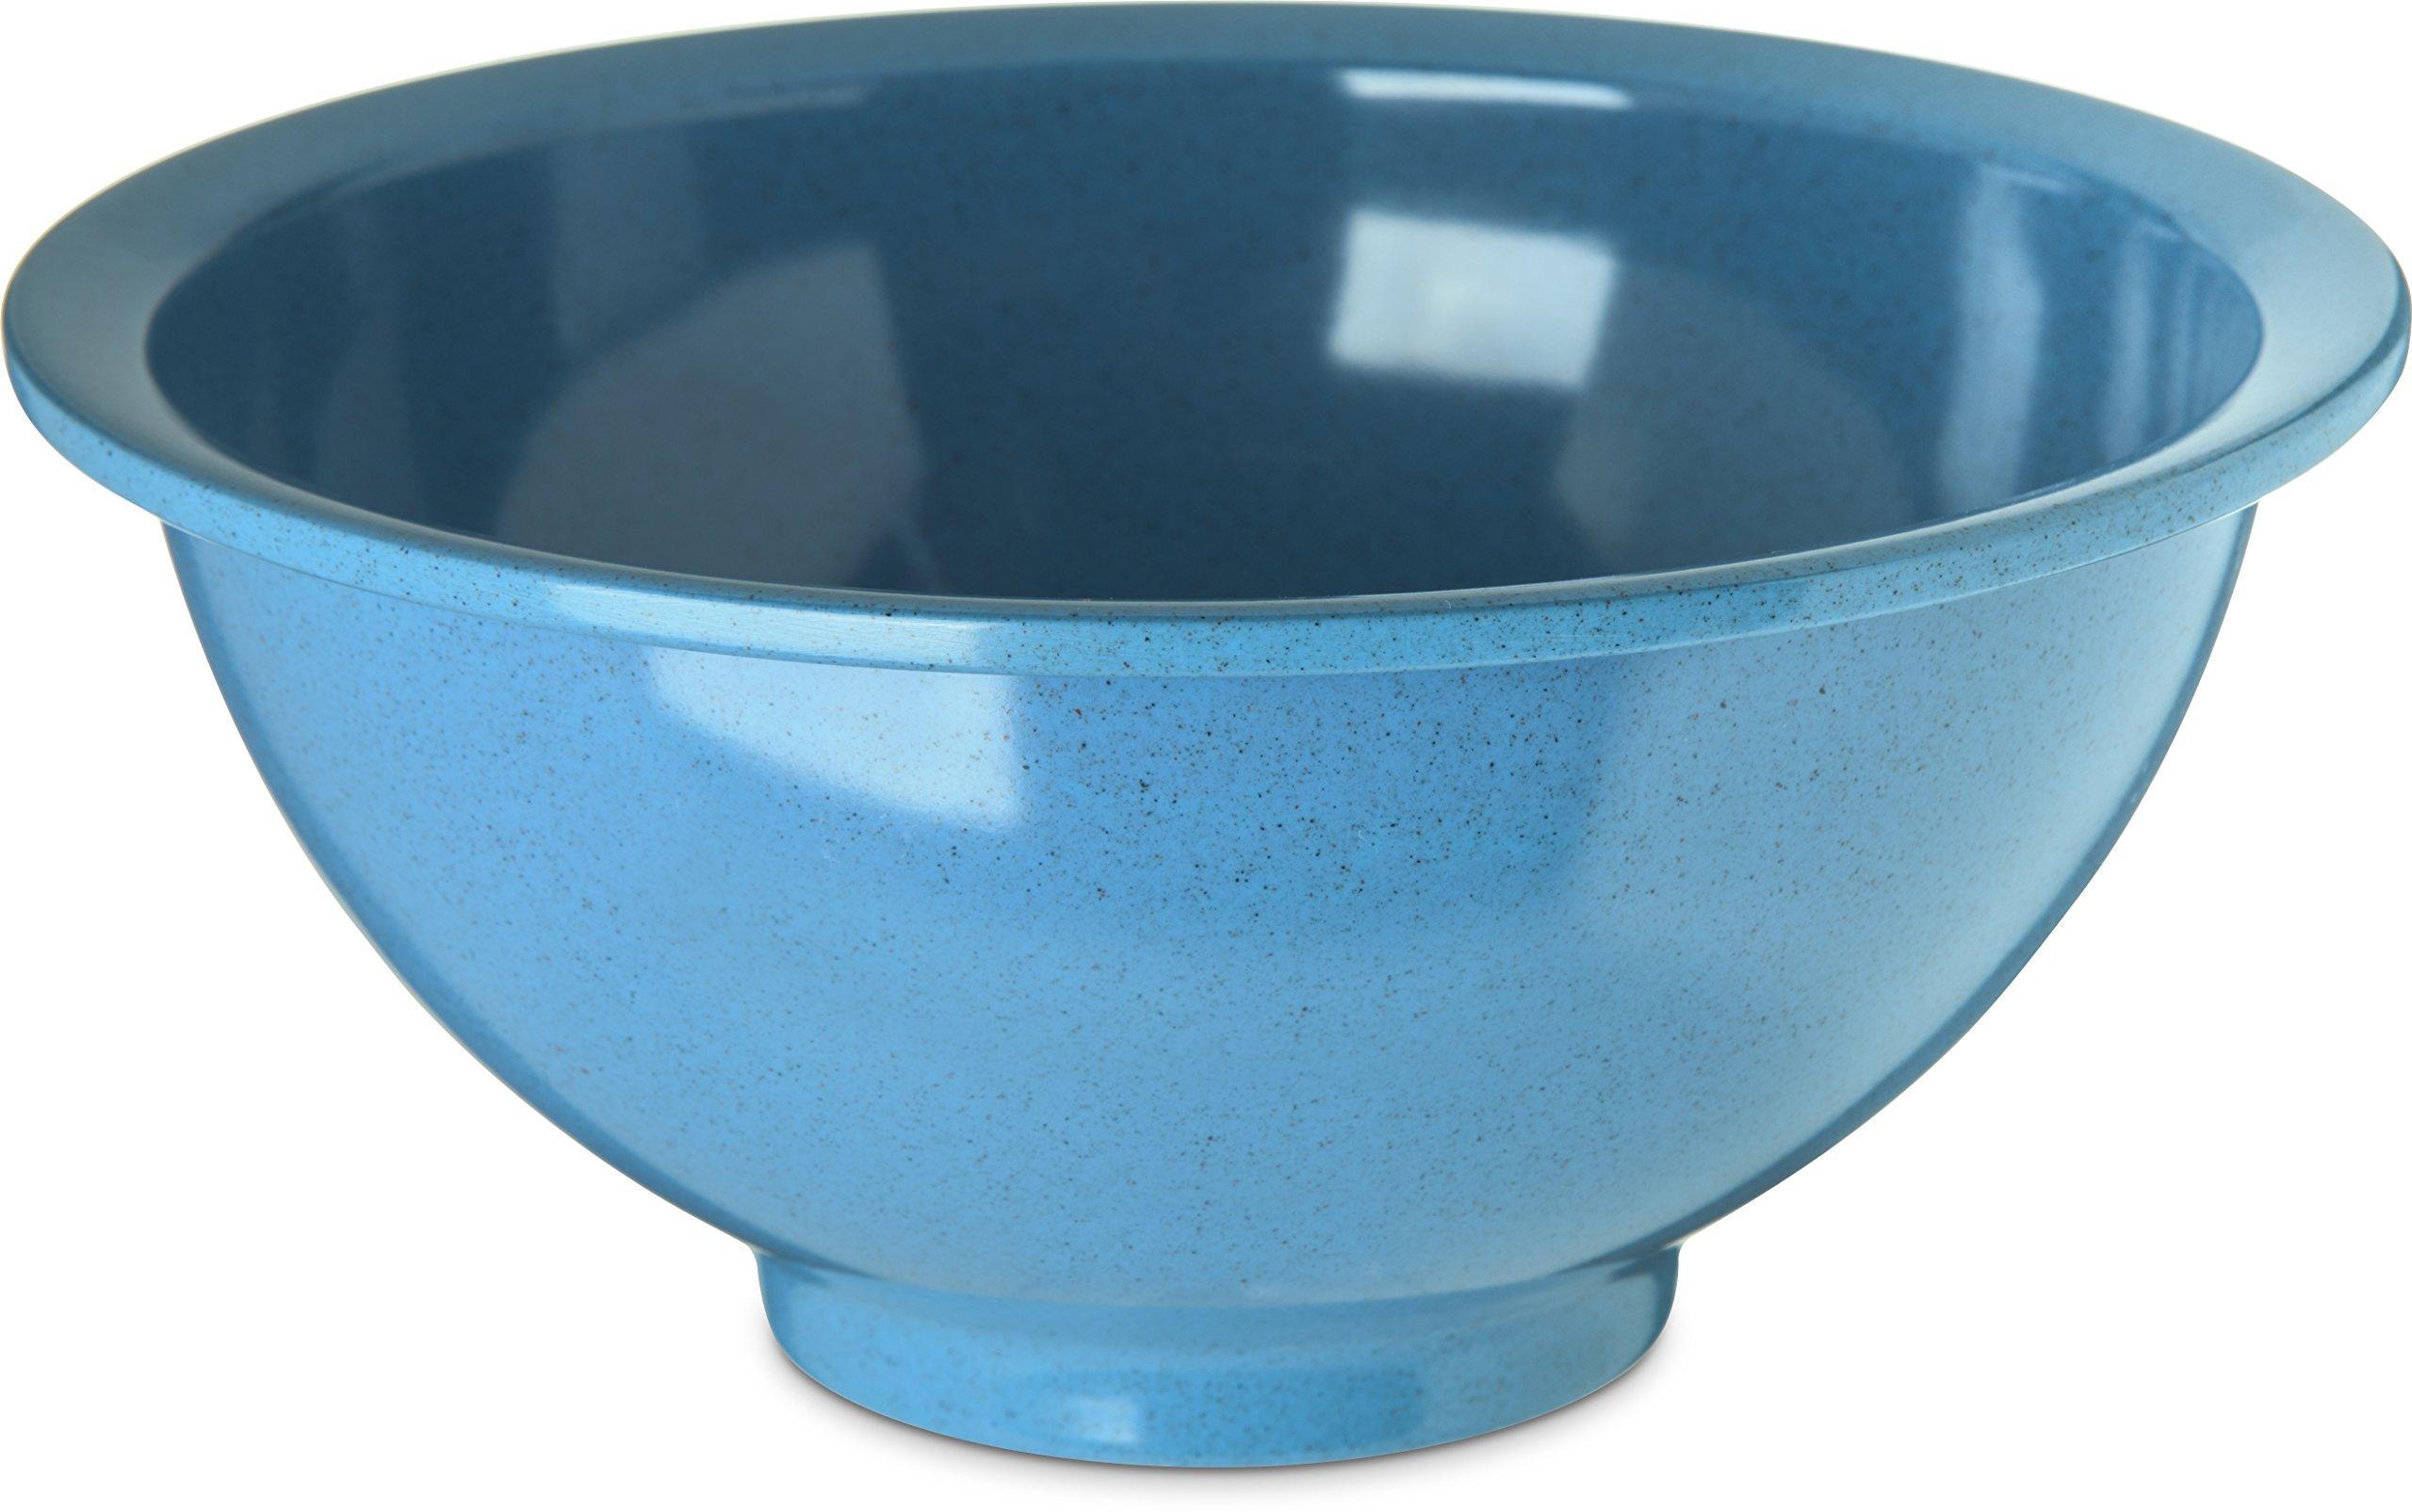 Sandshade Heavy-Duty 8 inch Melamine Mixing Bowl 1.5 Quart -- 12 per case